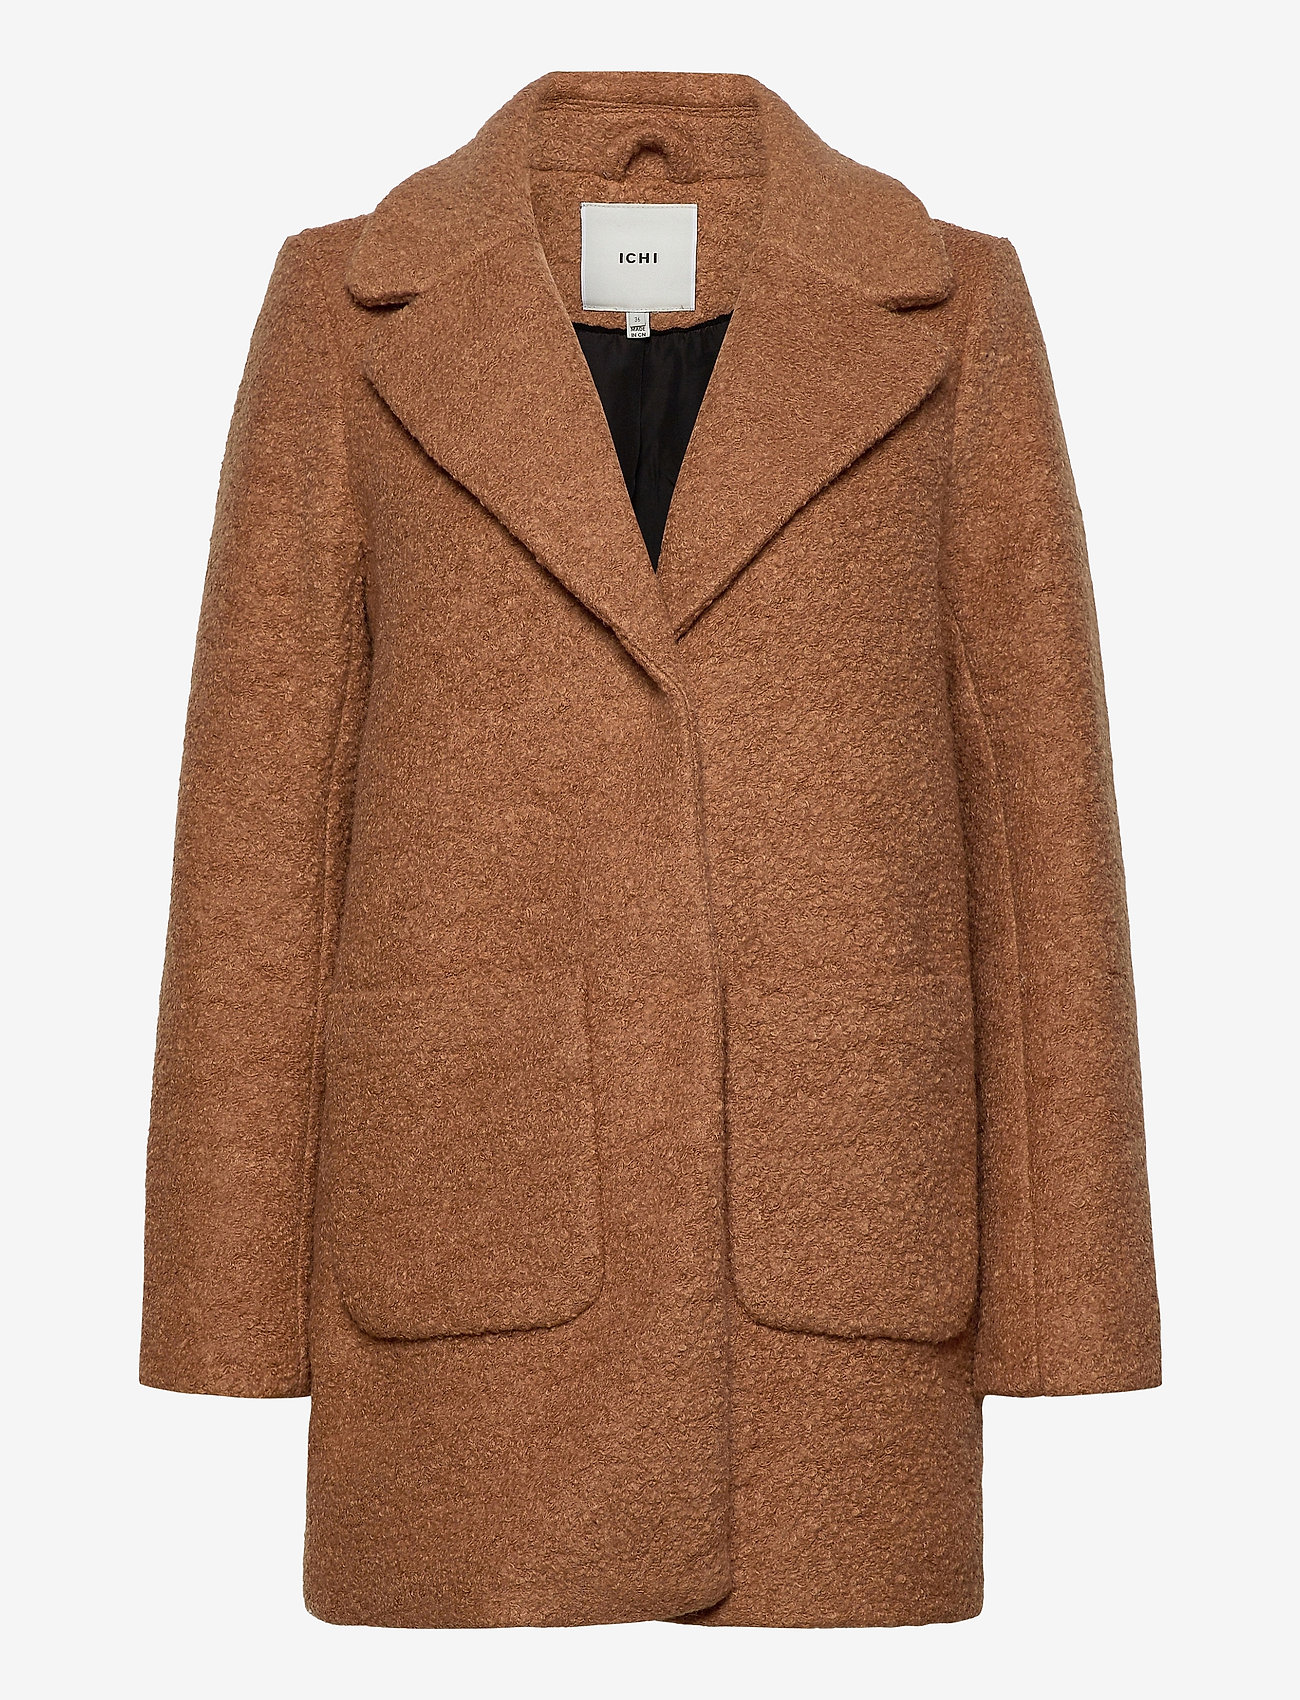 ICHI - STIPA JA - wool coats - thrunsh - 0